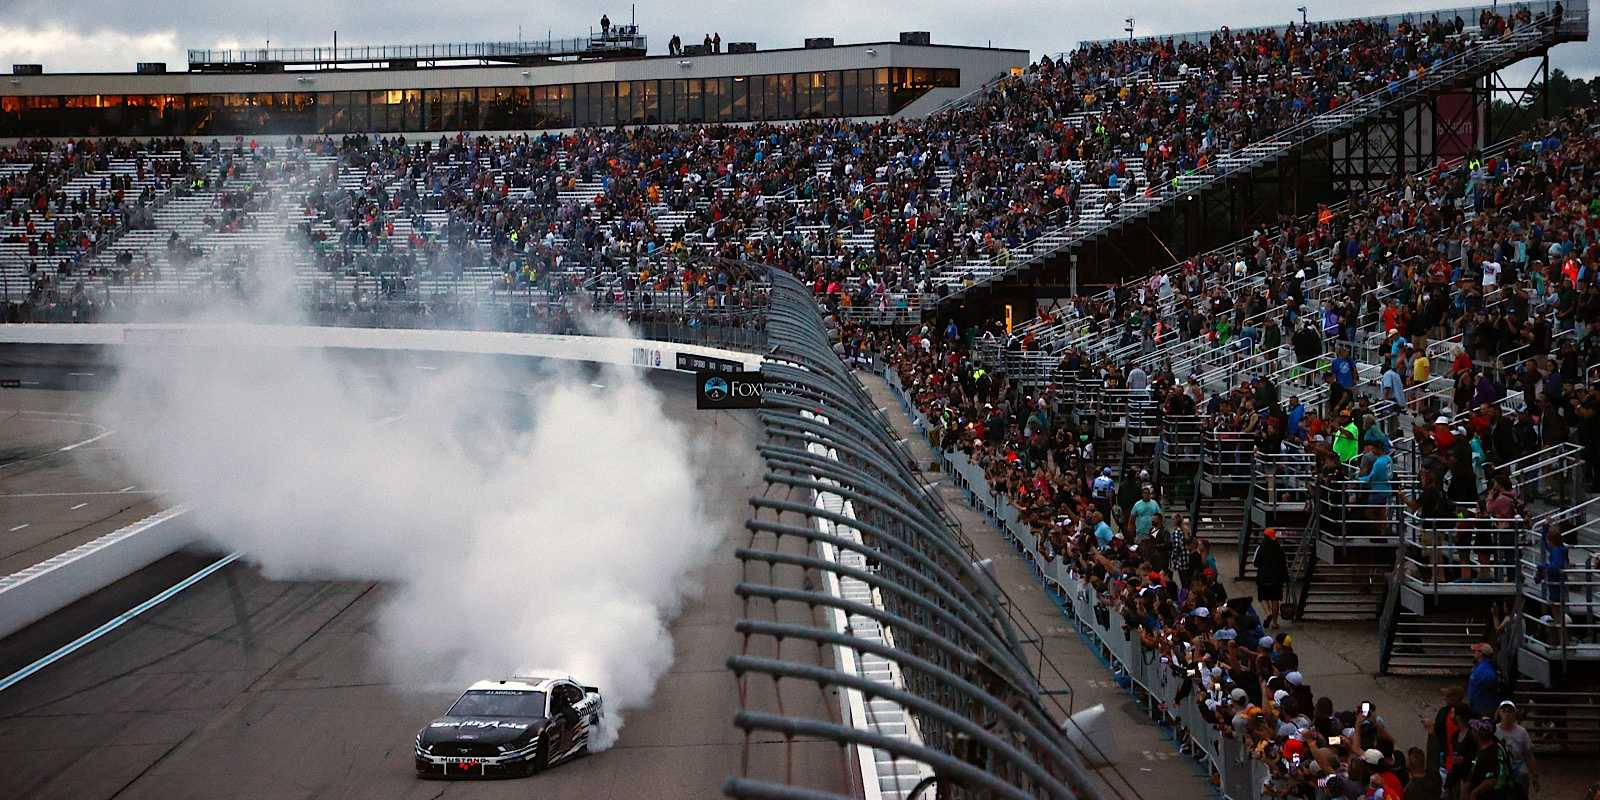 NASCAR at NHMS Recap: Almirola Wins and Shakes Up Standings